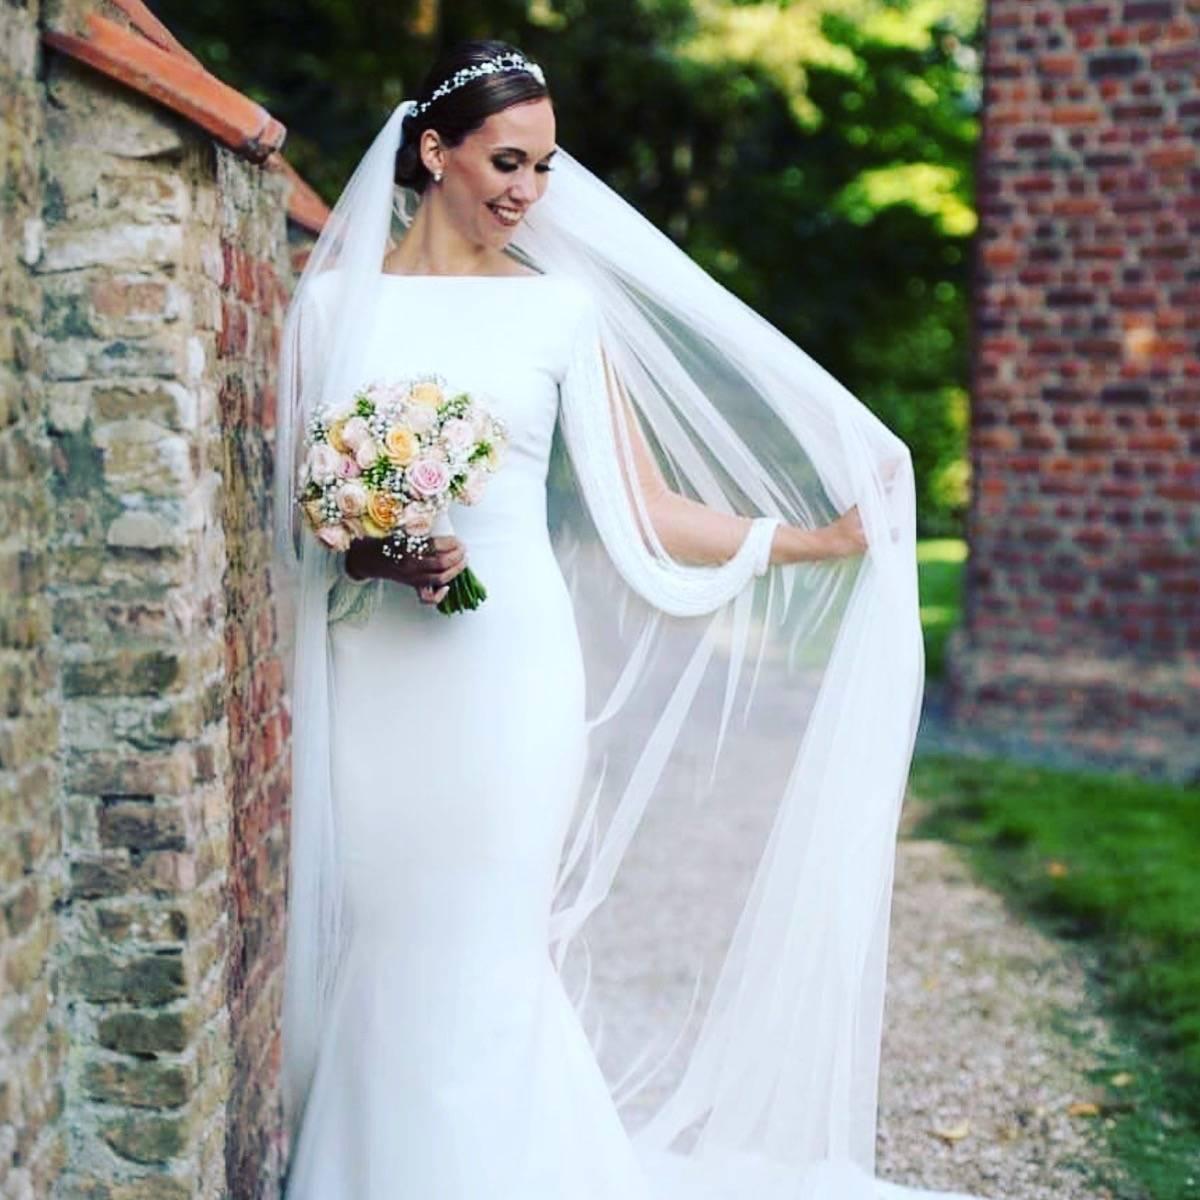 Michèle Feyaerts - Bruidskapsel - Bruidsmake-up - House of Weddings - 36